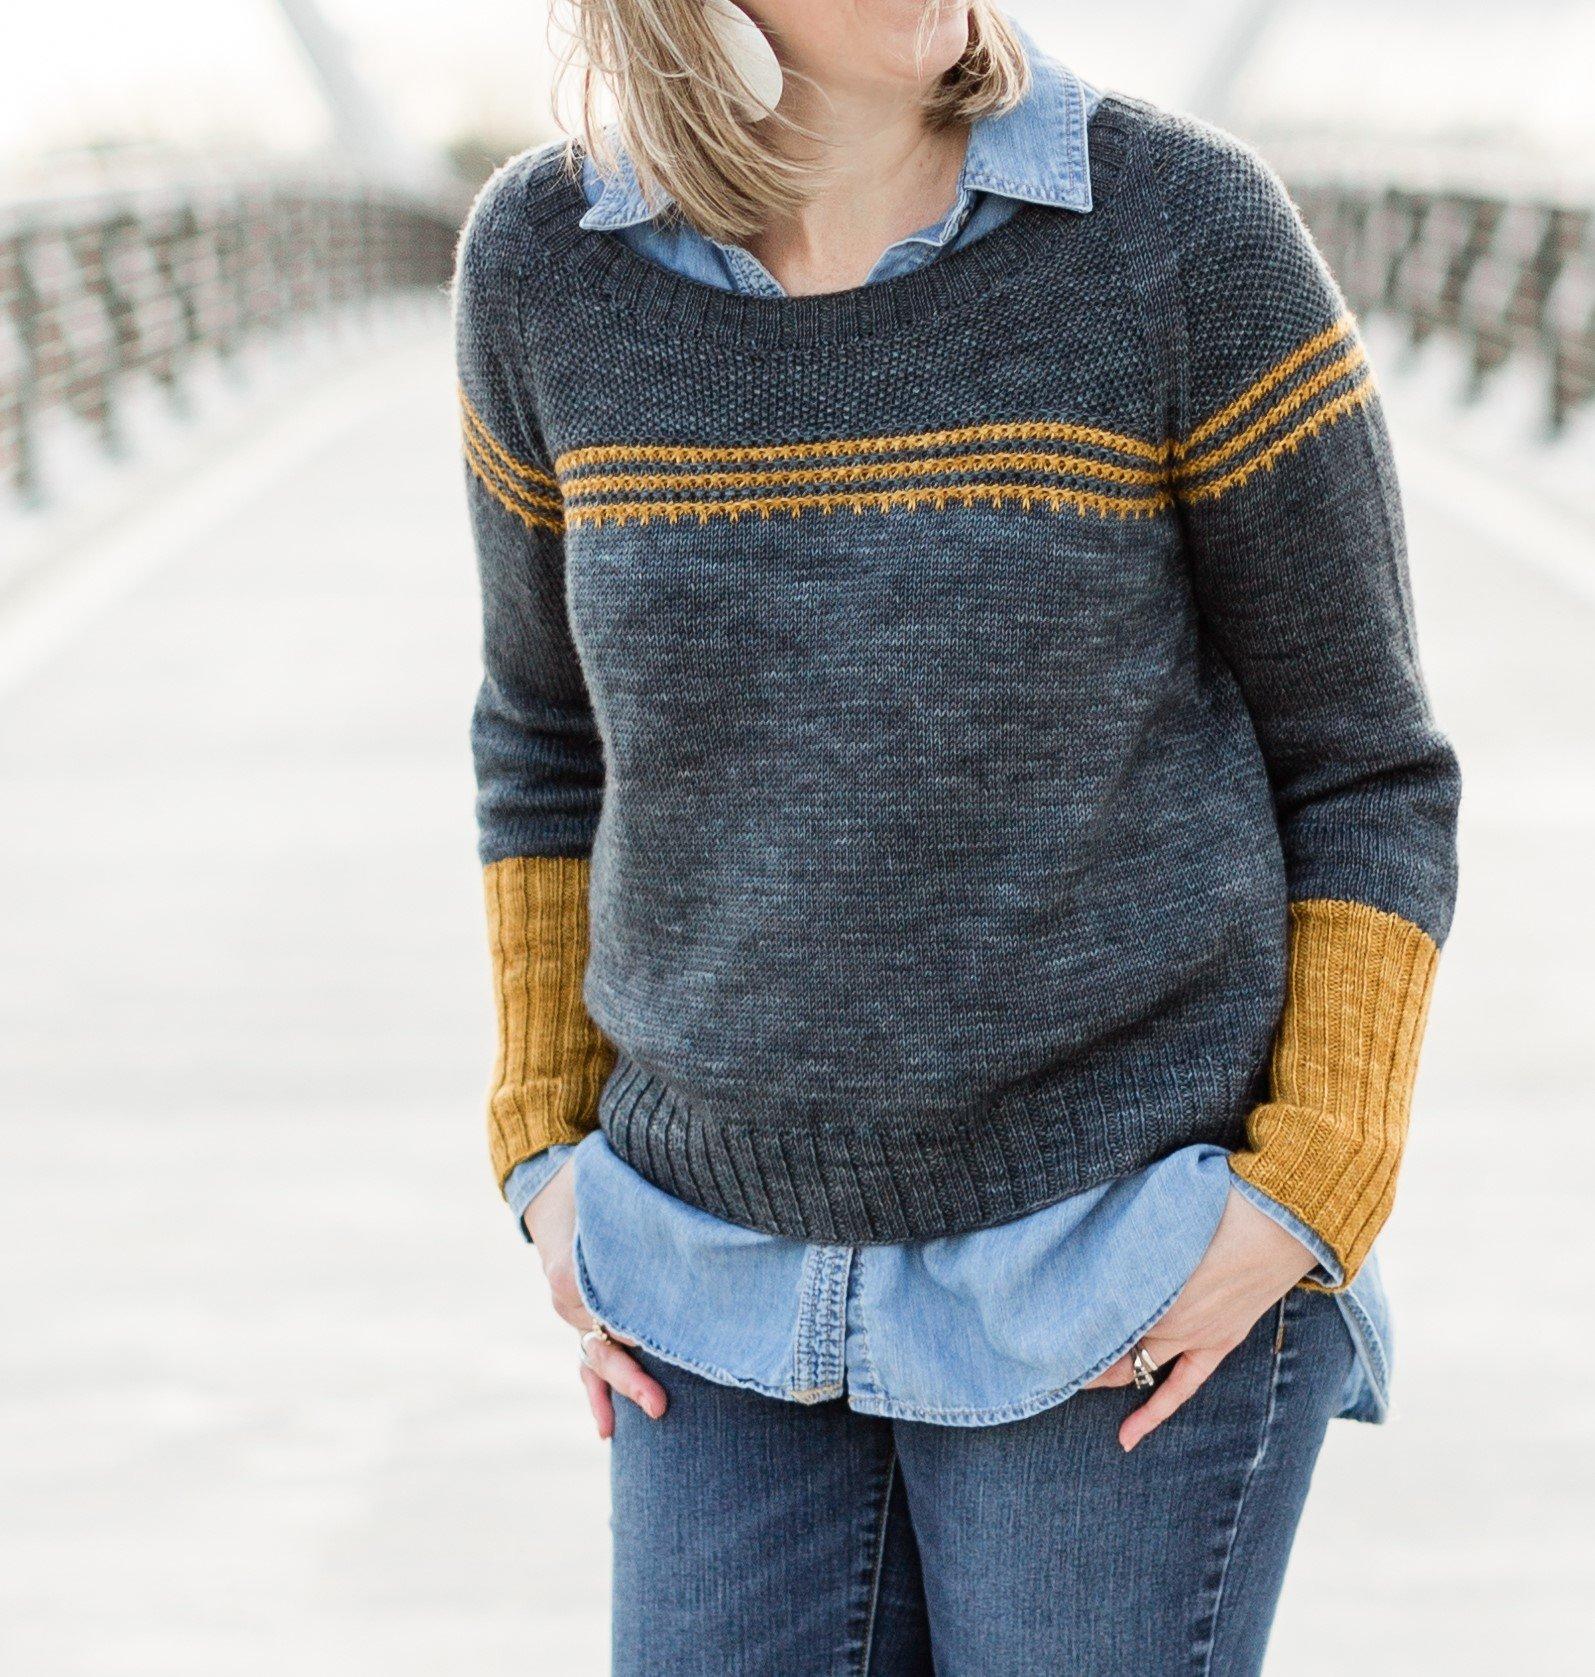 Petra sweater by Marie Greene